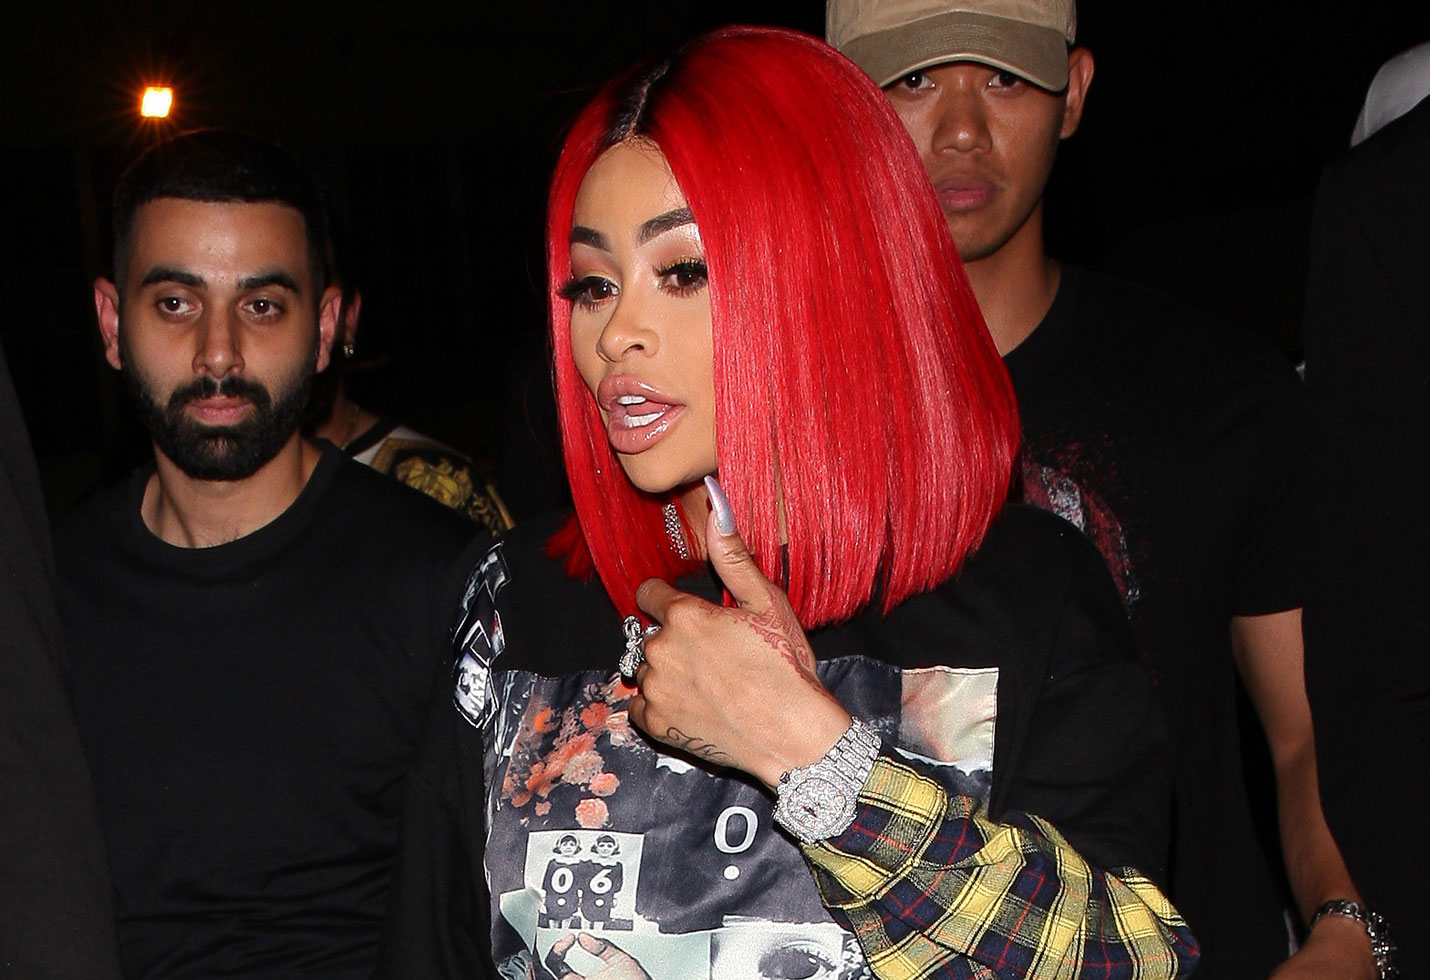 Blac Chyna Rob Kardashian child support fight Dream Tyga King custody